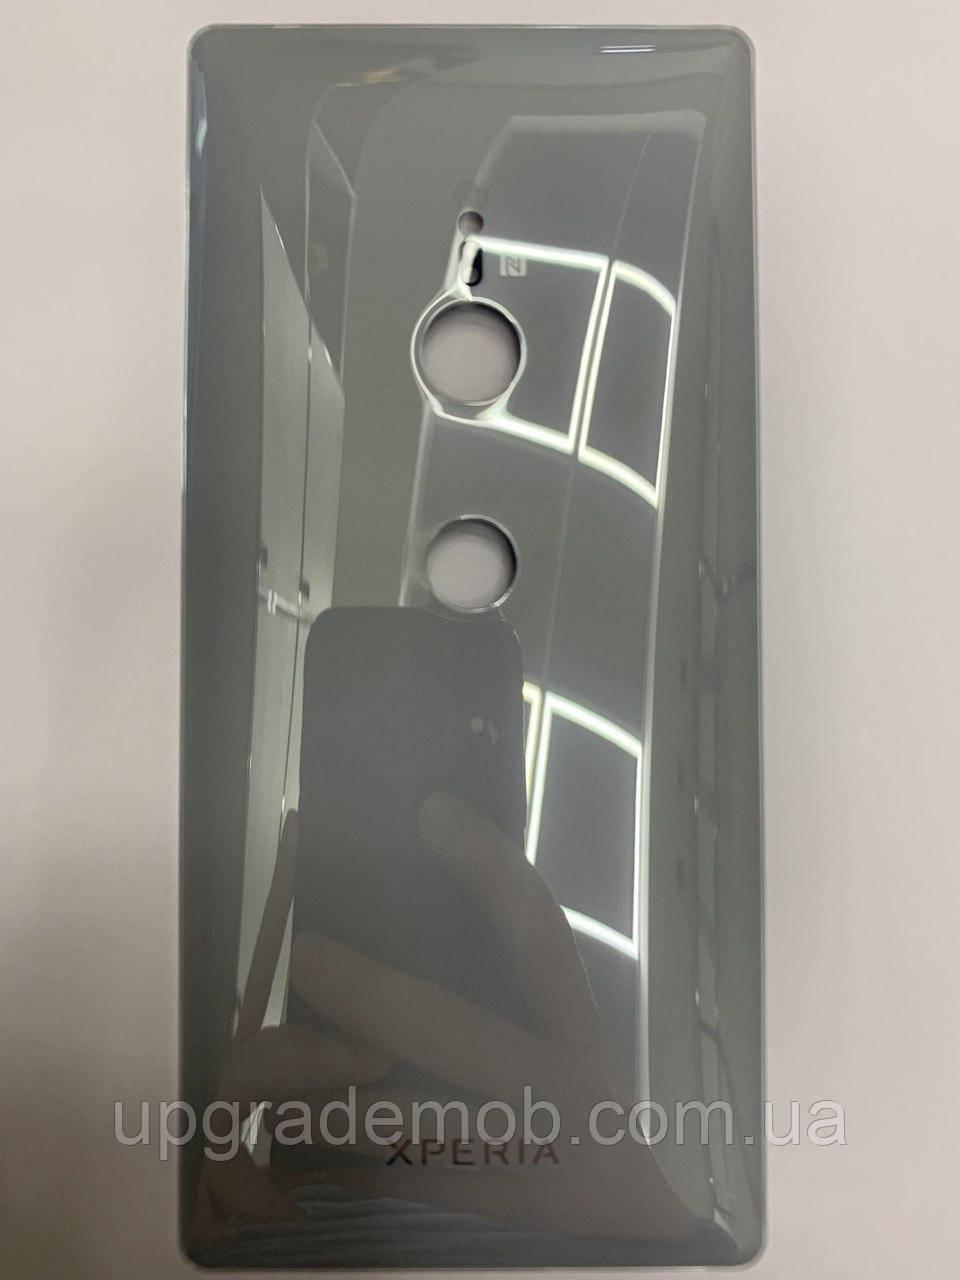 Задняя крышка Sony H8216 Xperia XZ2/H8266/H8276/H8296, серебристая, Liquid Silver, оригинал